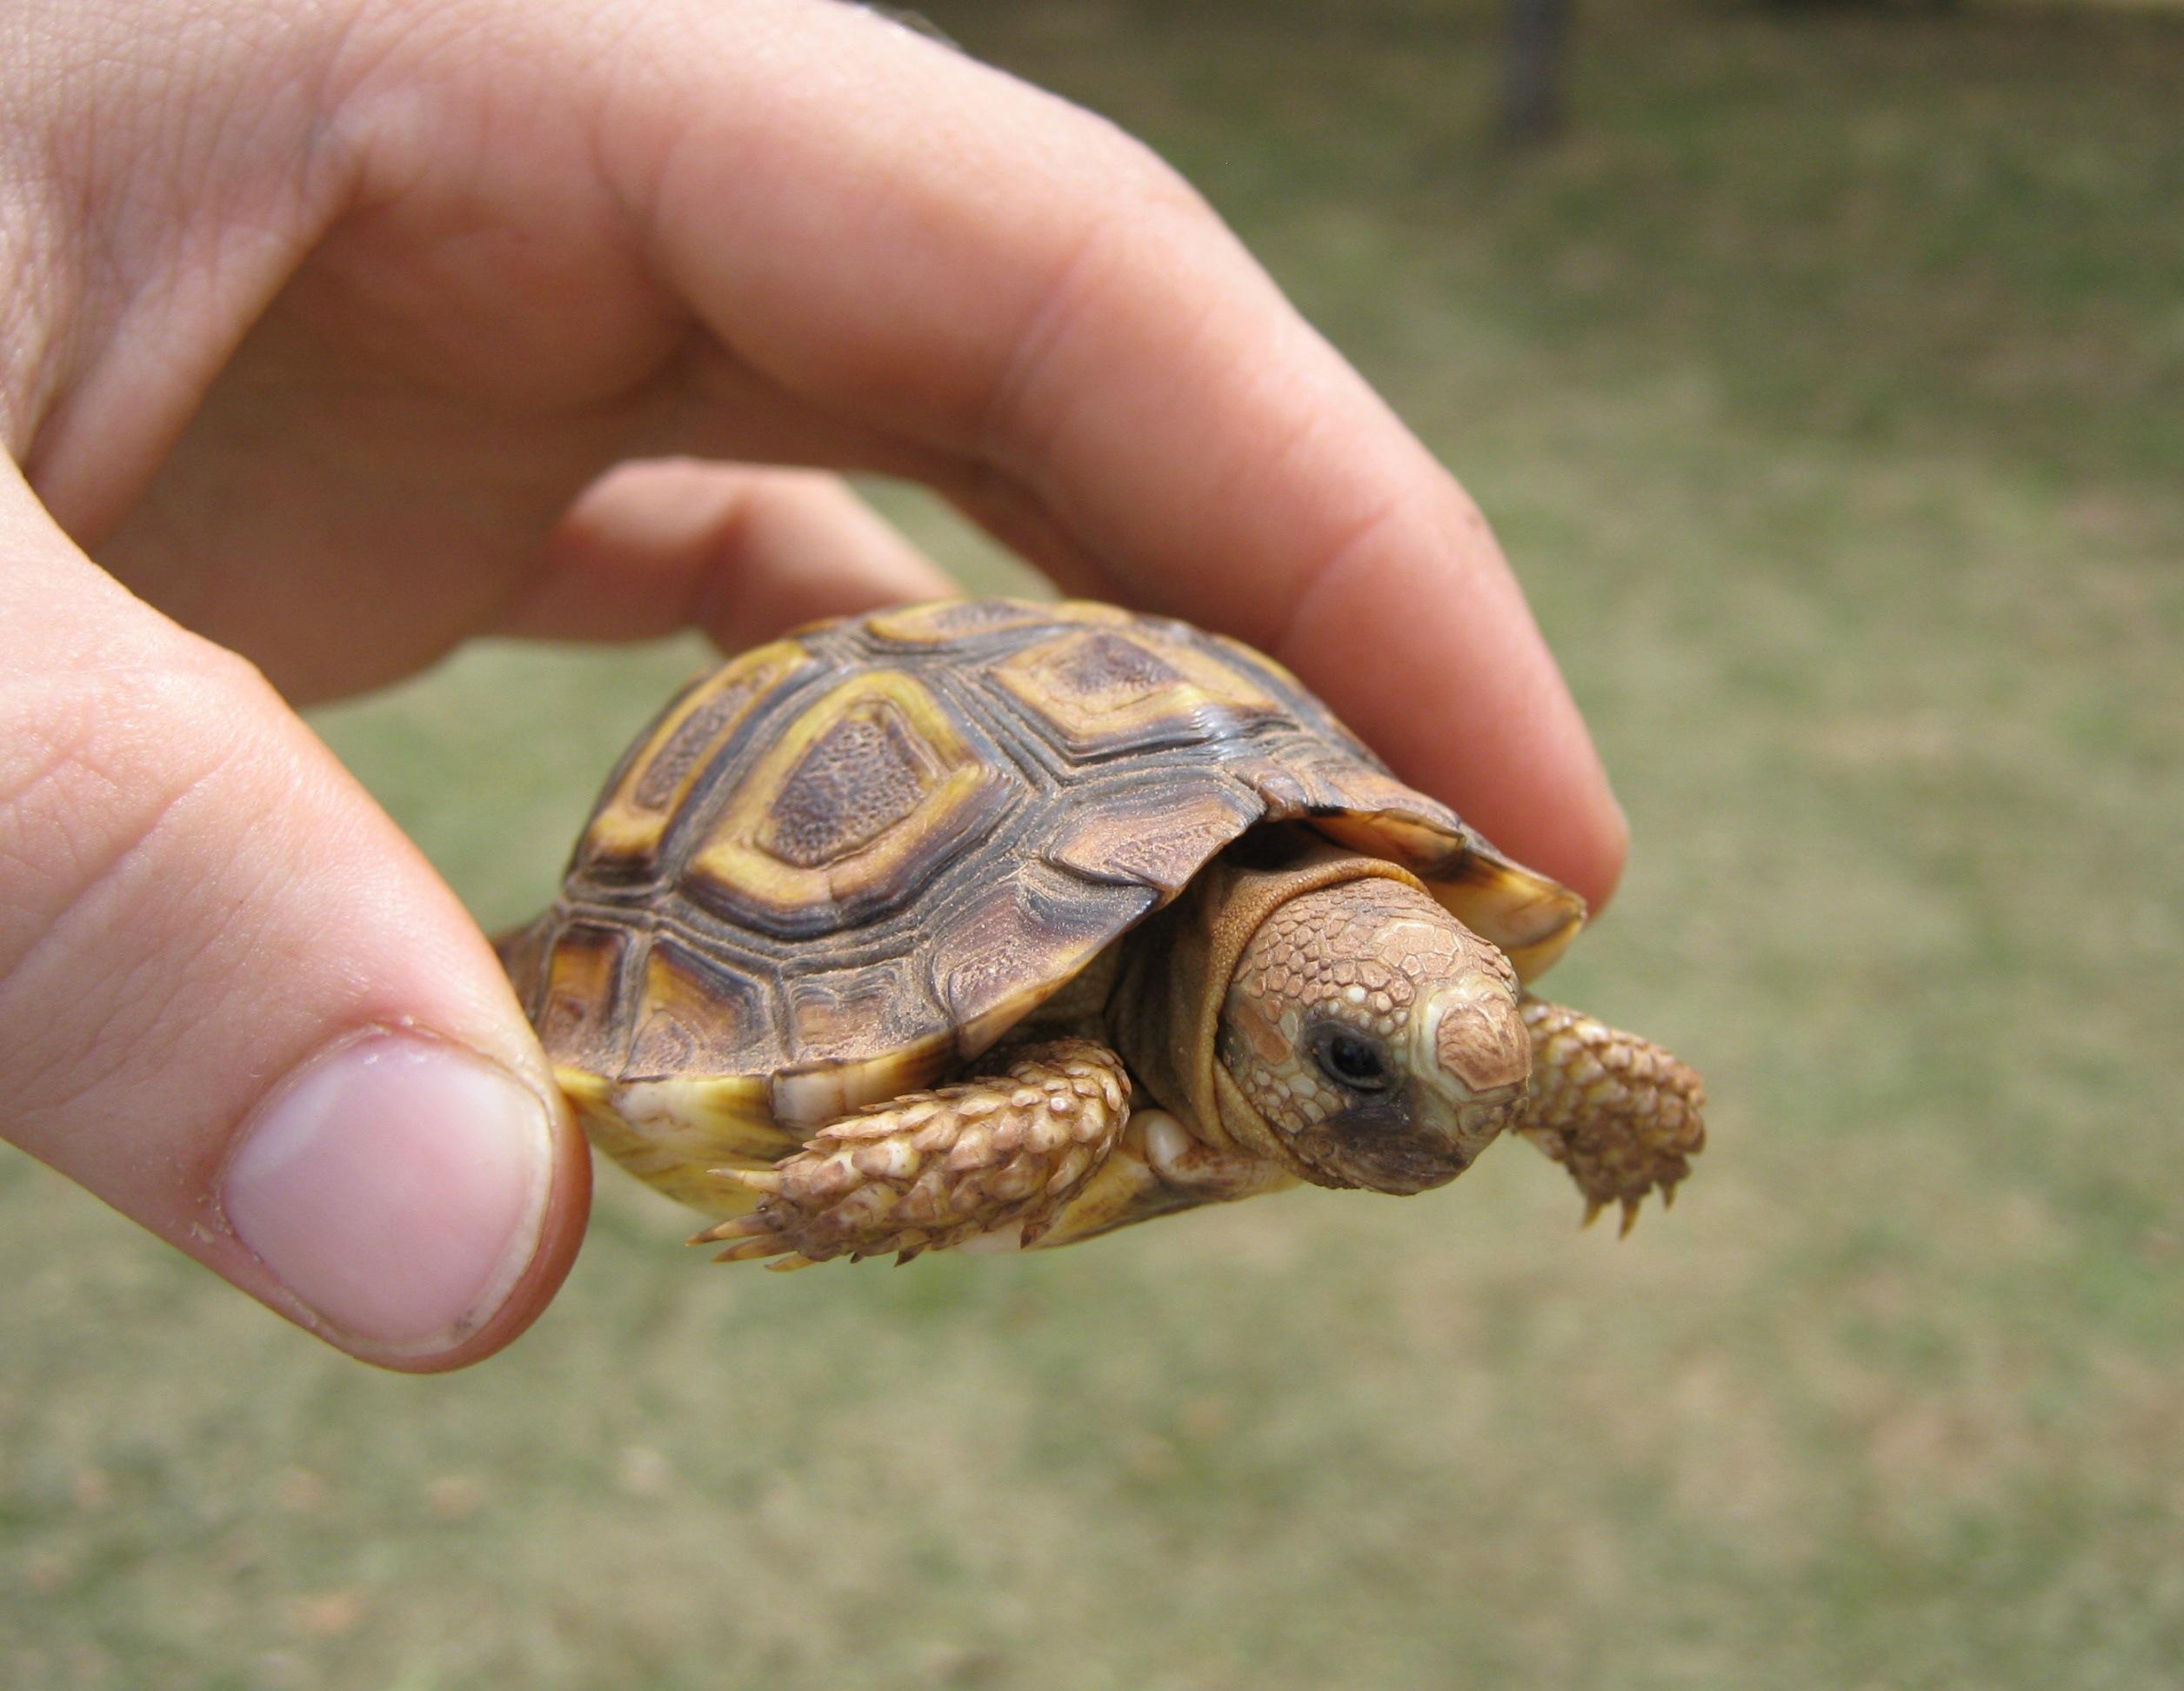 Can A Turtle Endure A Car Ride